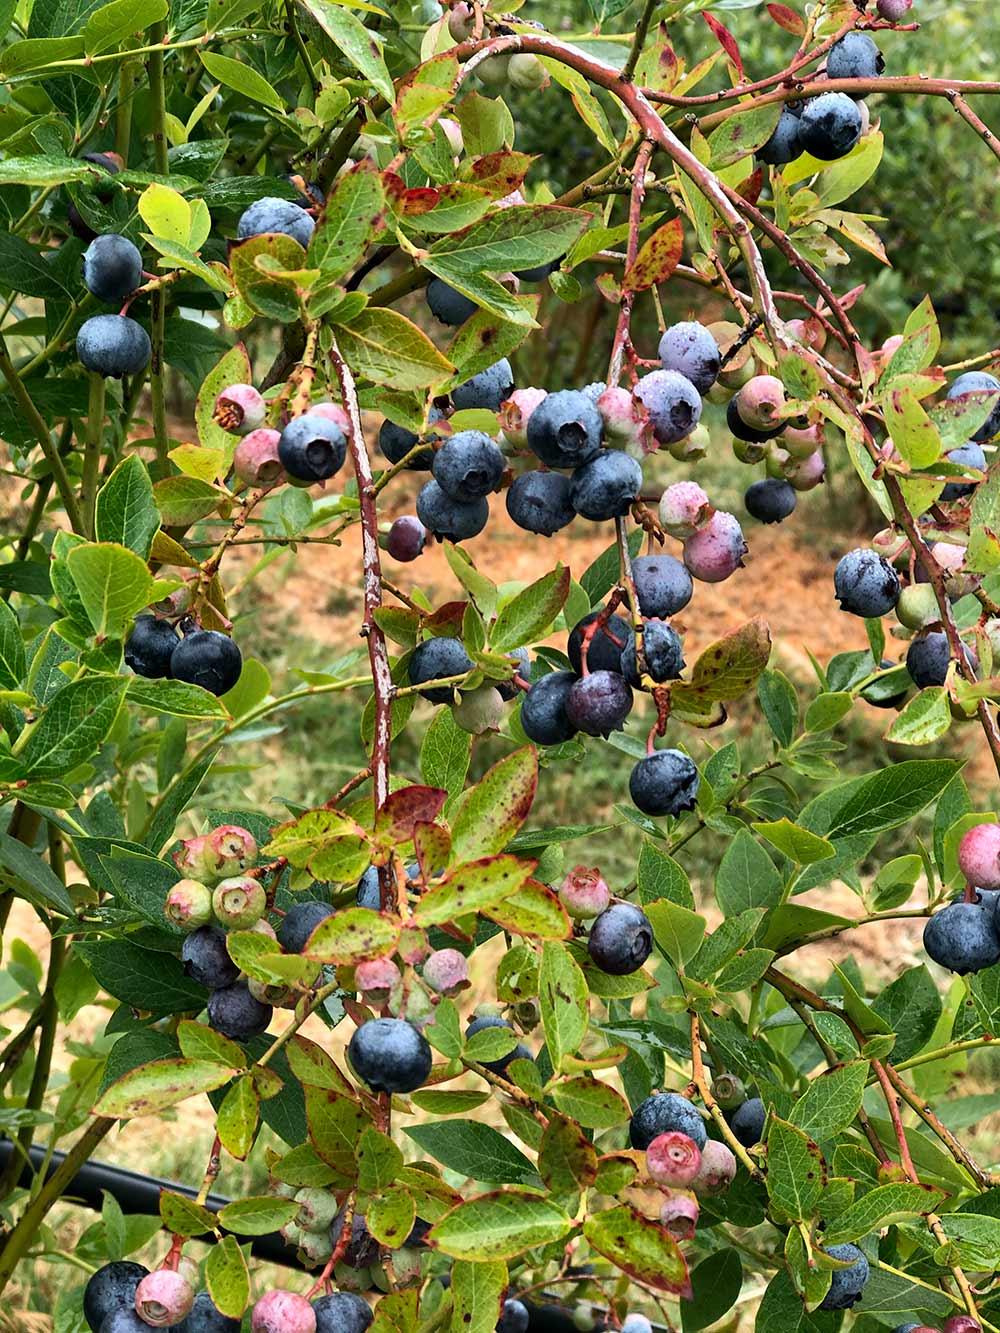 duckworth farms blueberries on vine